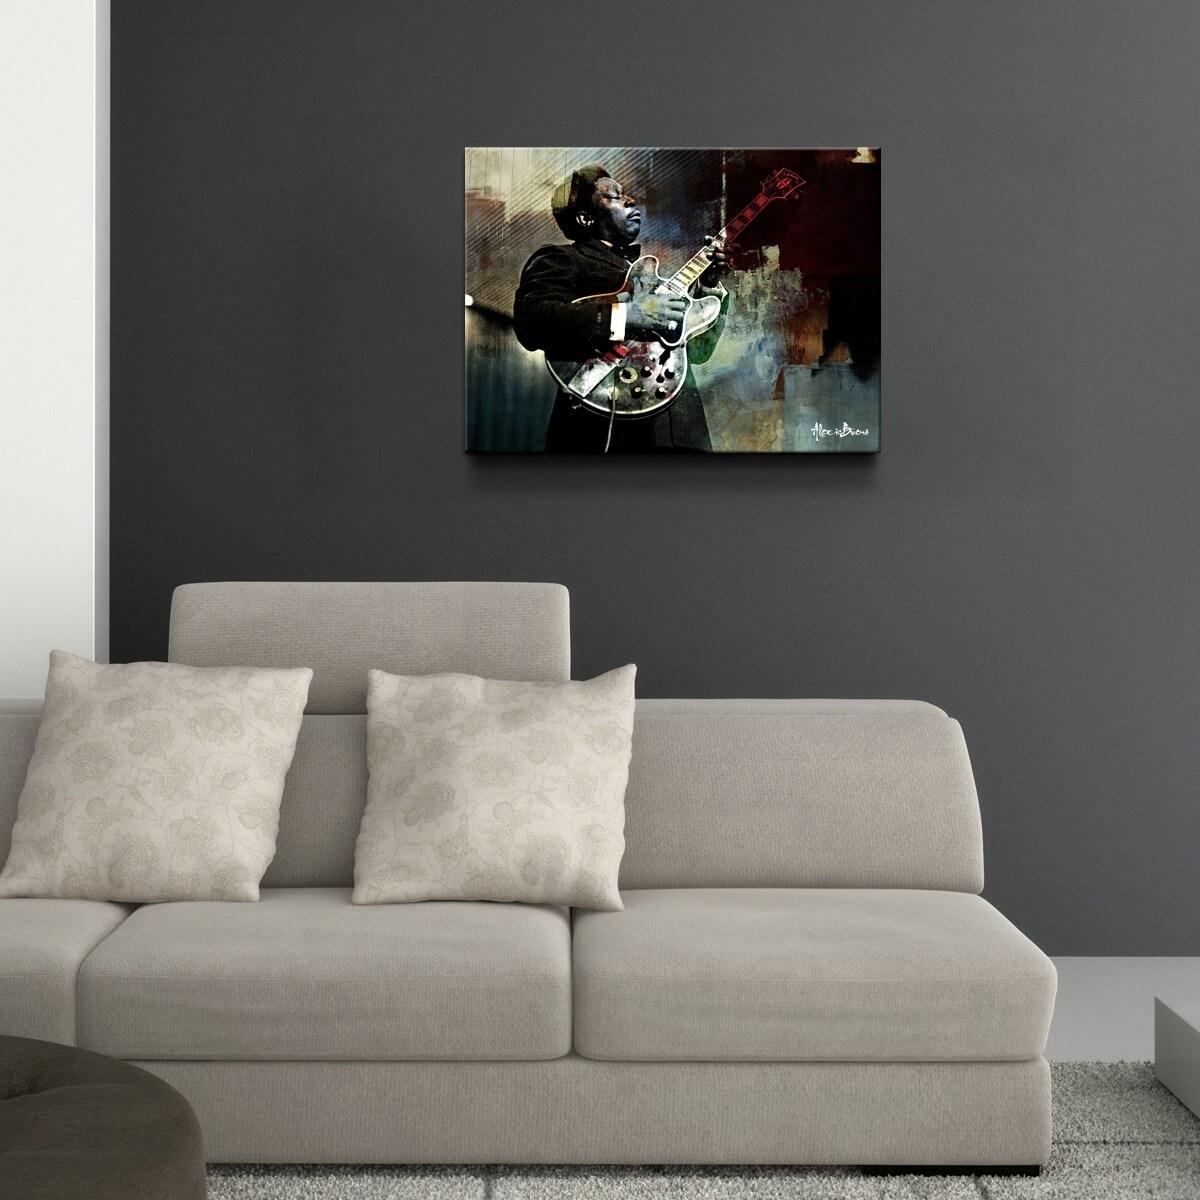 Details about ready2hangart muzik xxi oversized canvas wall art